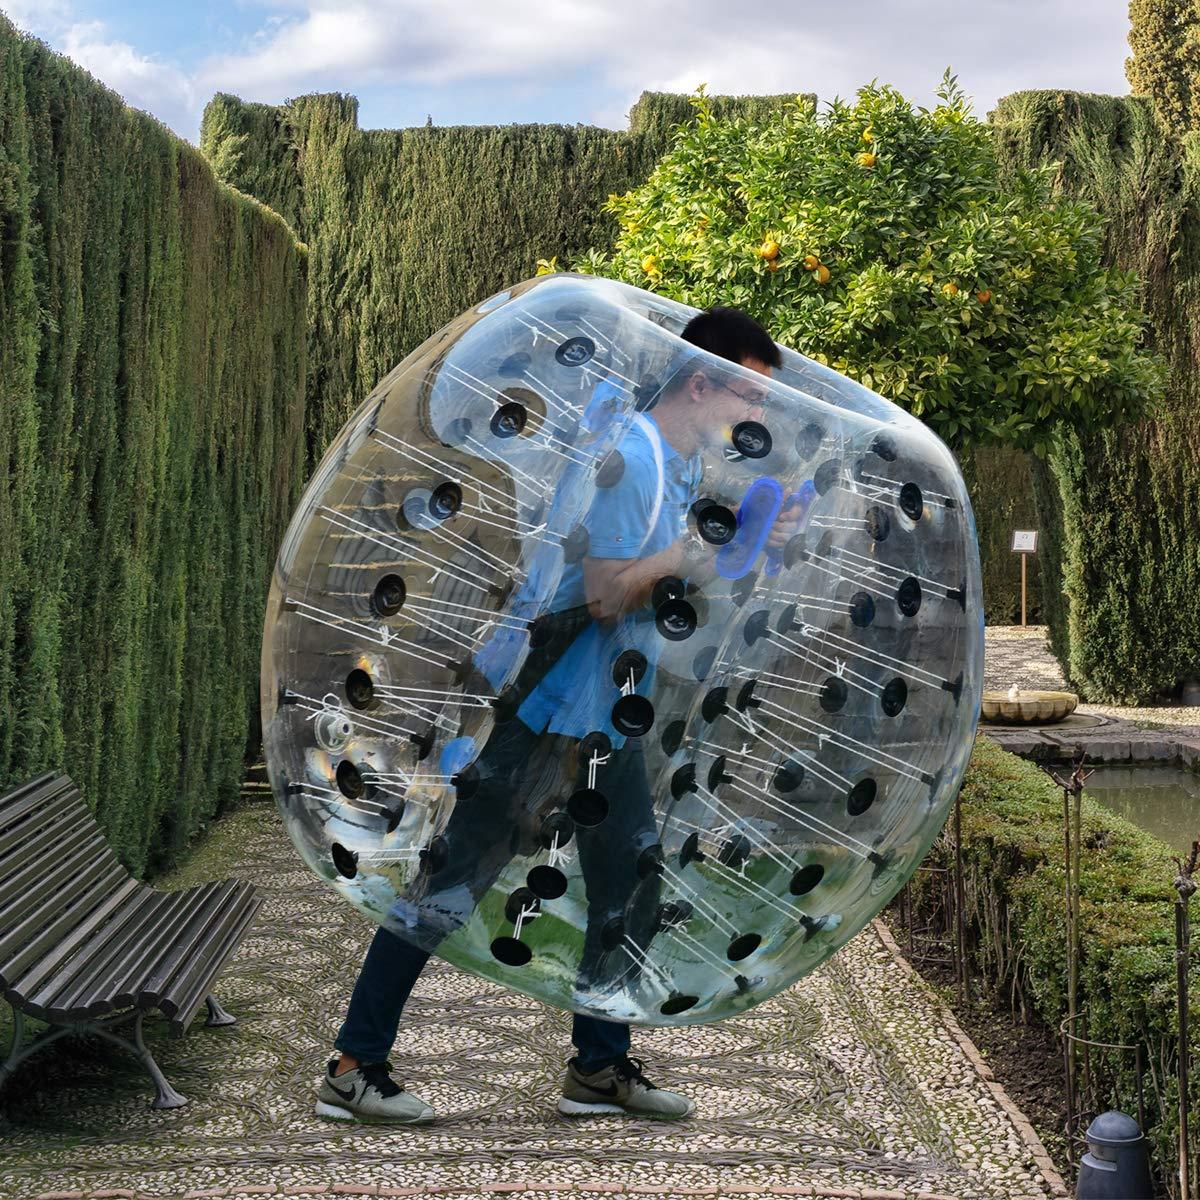 Amazon.com: Pelota de burbuja inflable Costzon, diámetro de ...